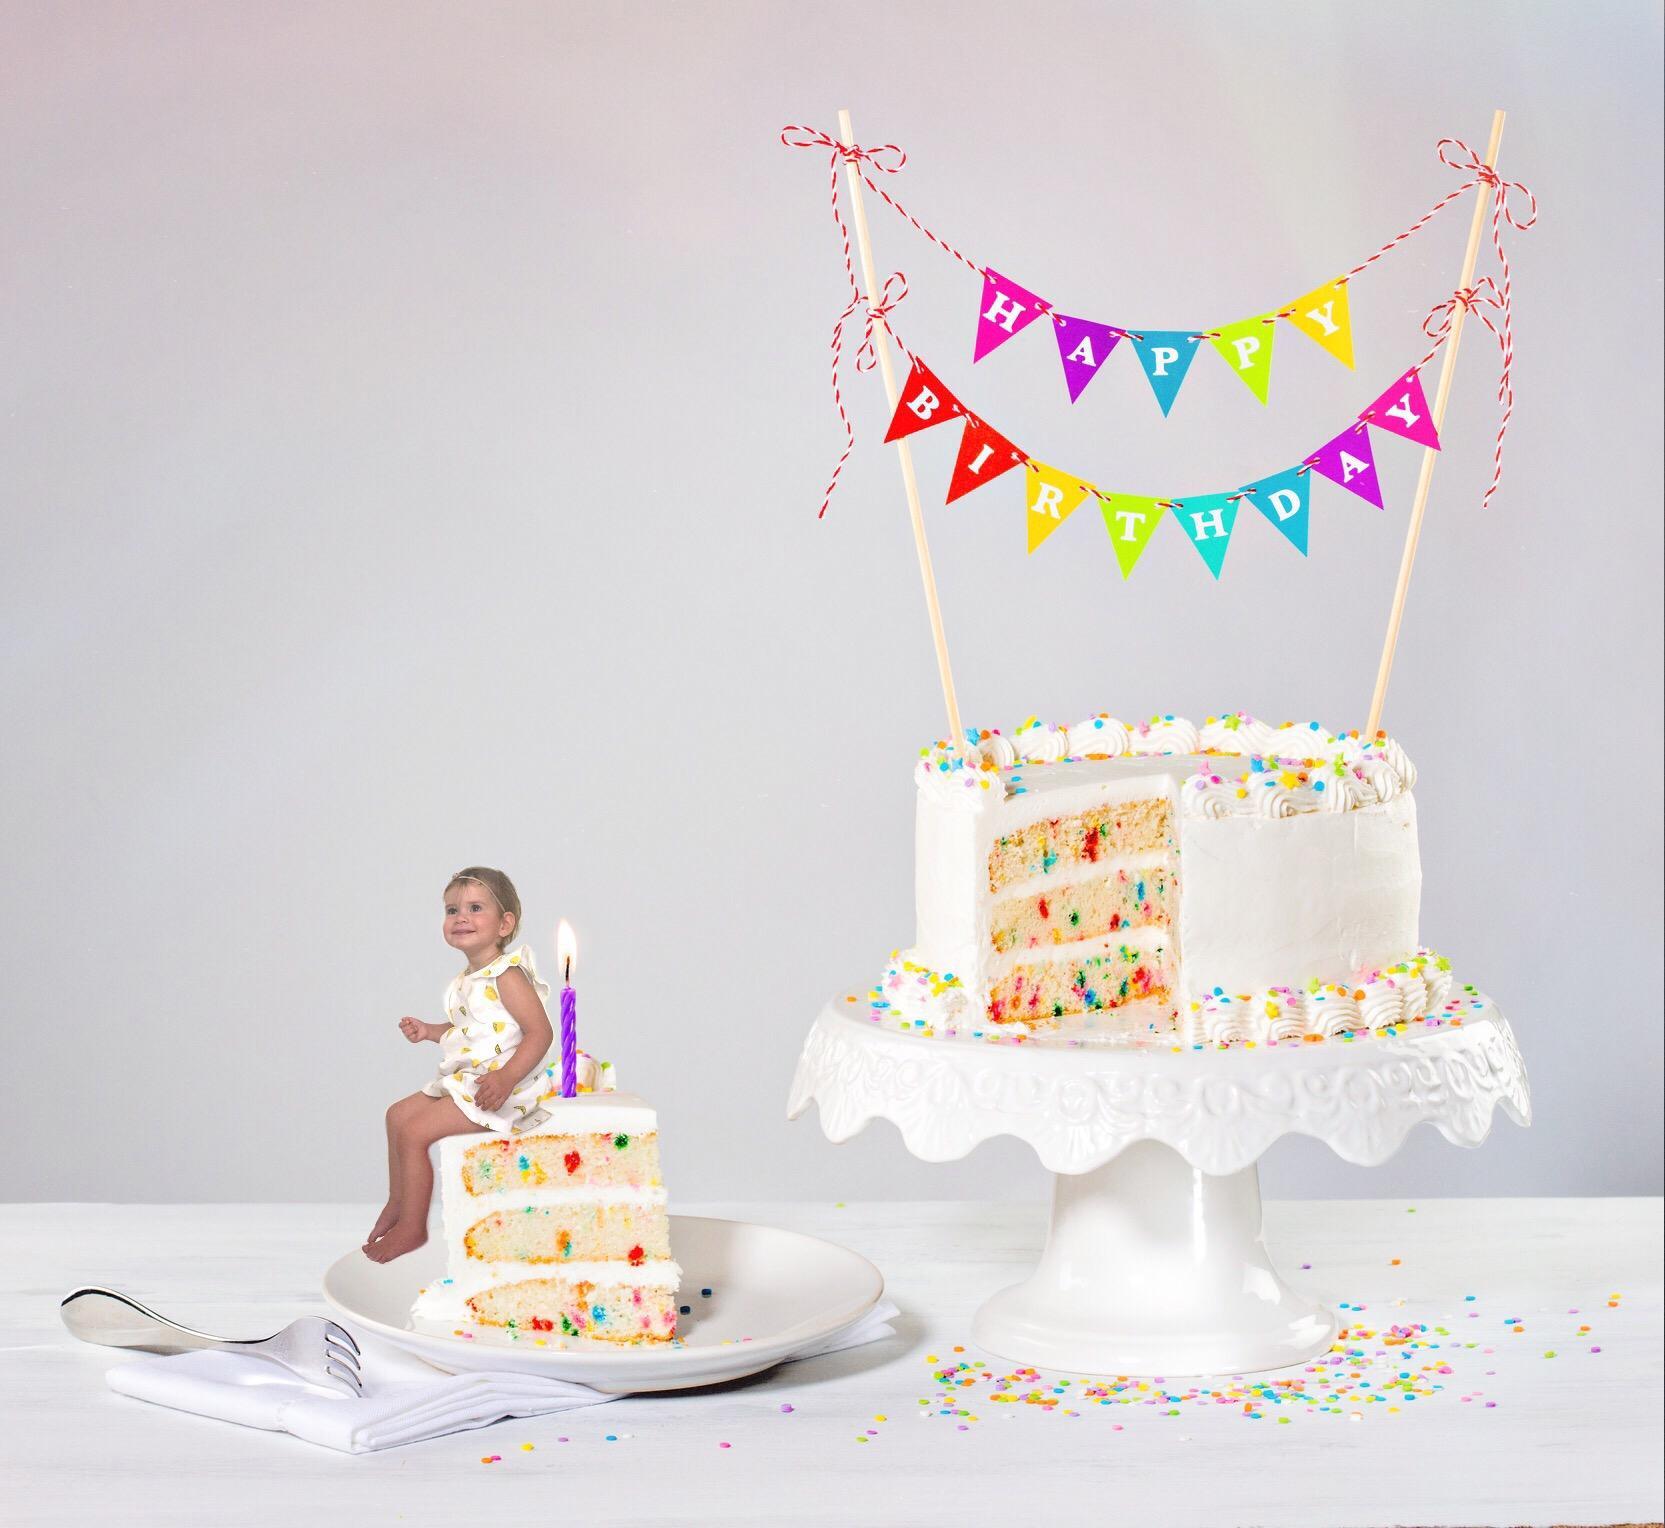 Birthdaycake tutorial